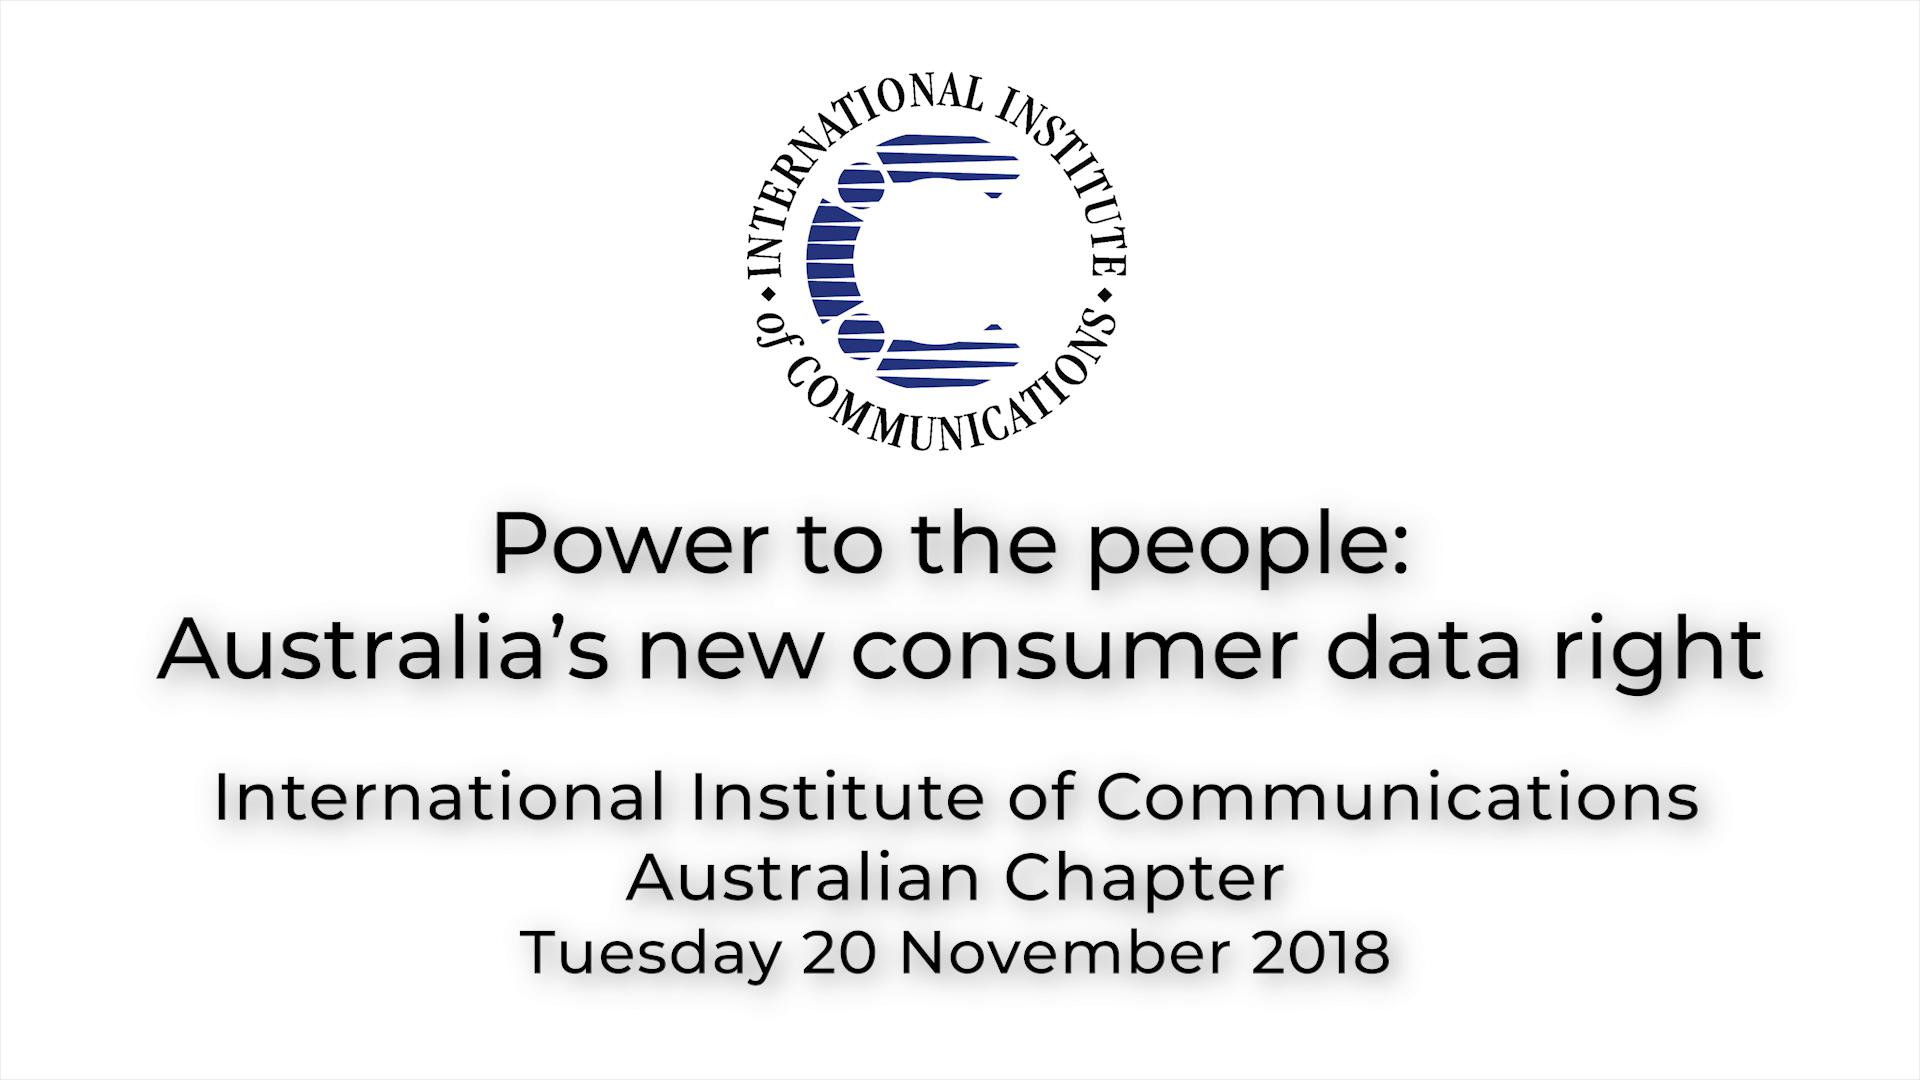 IIC Seminar - 20 November 2018